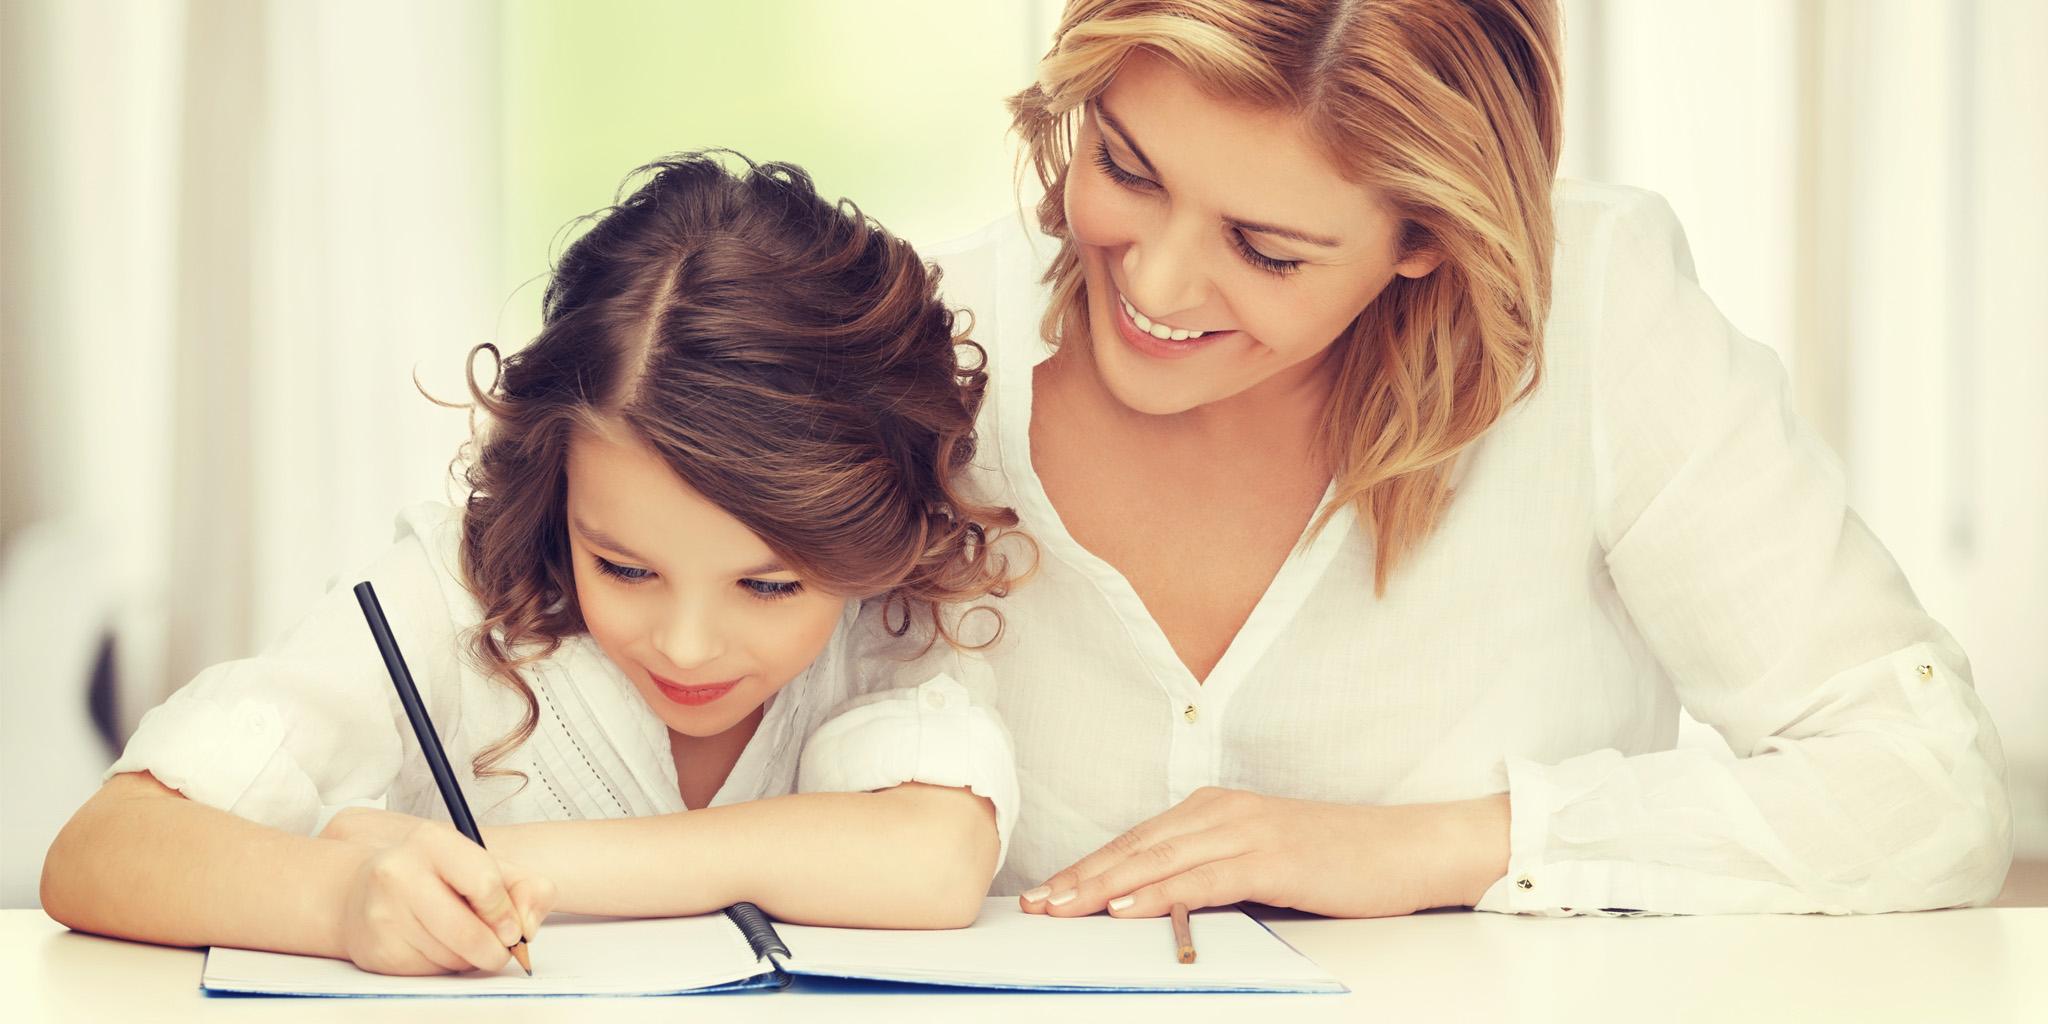 Aiutare i bambini coi compiti